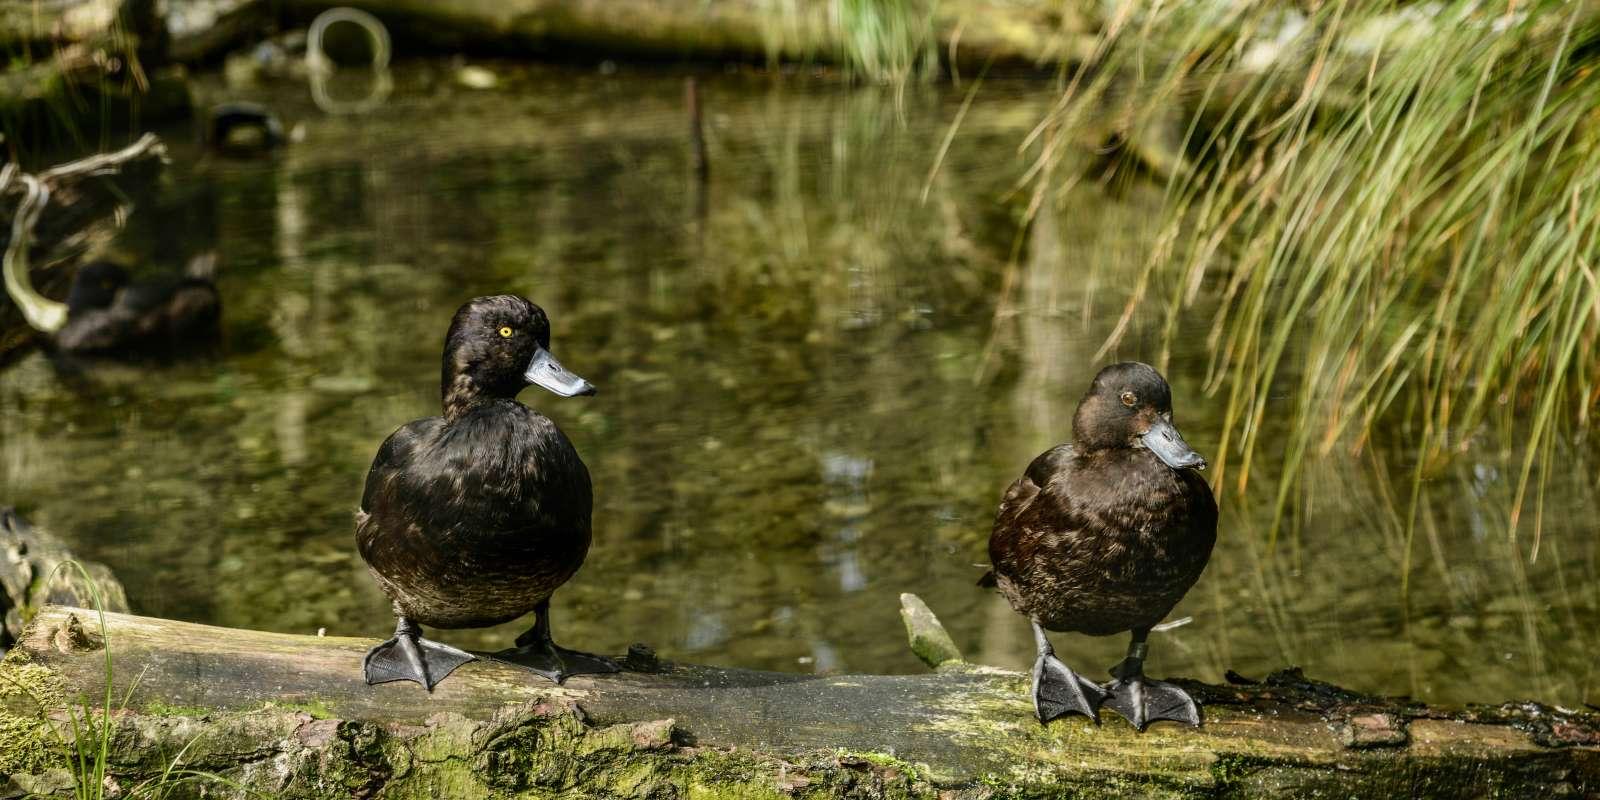 New Zealand Scaup ducks at Kiwi Birdlife Park